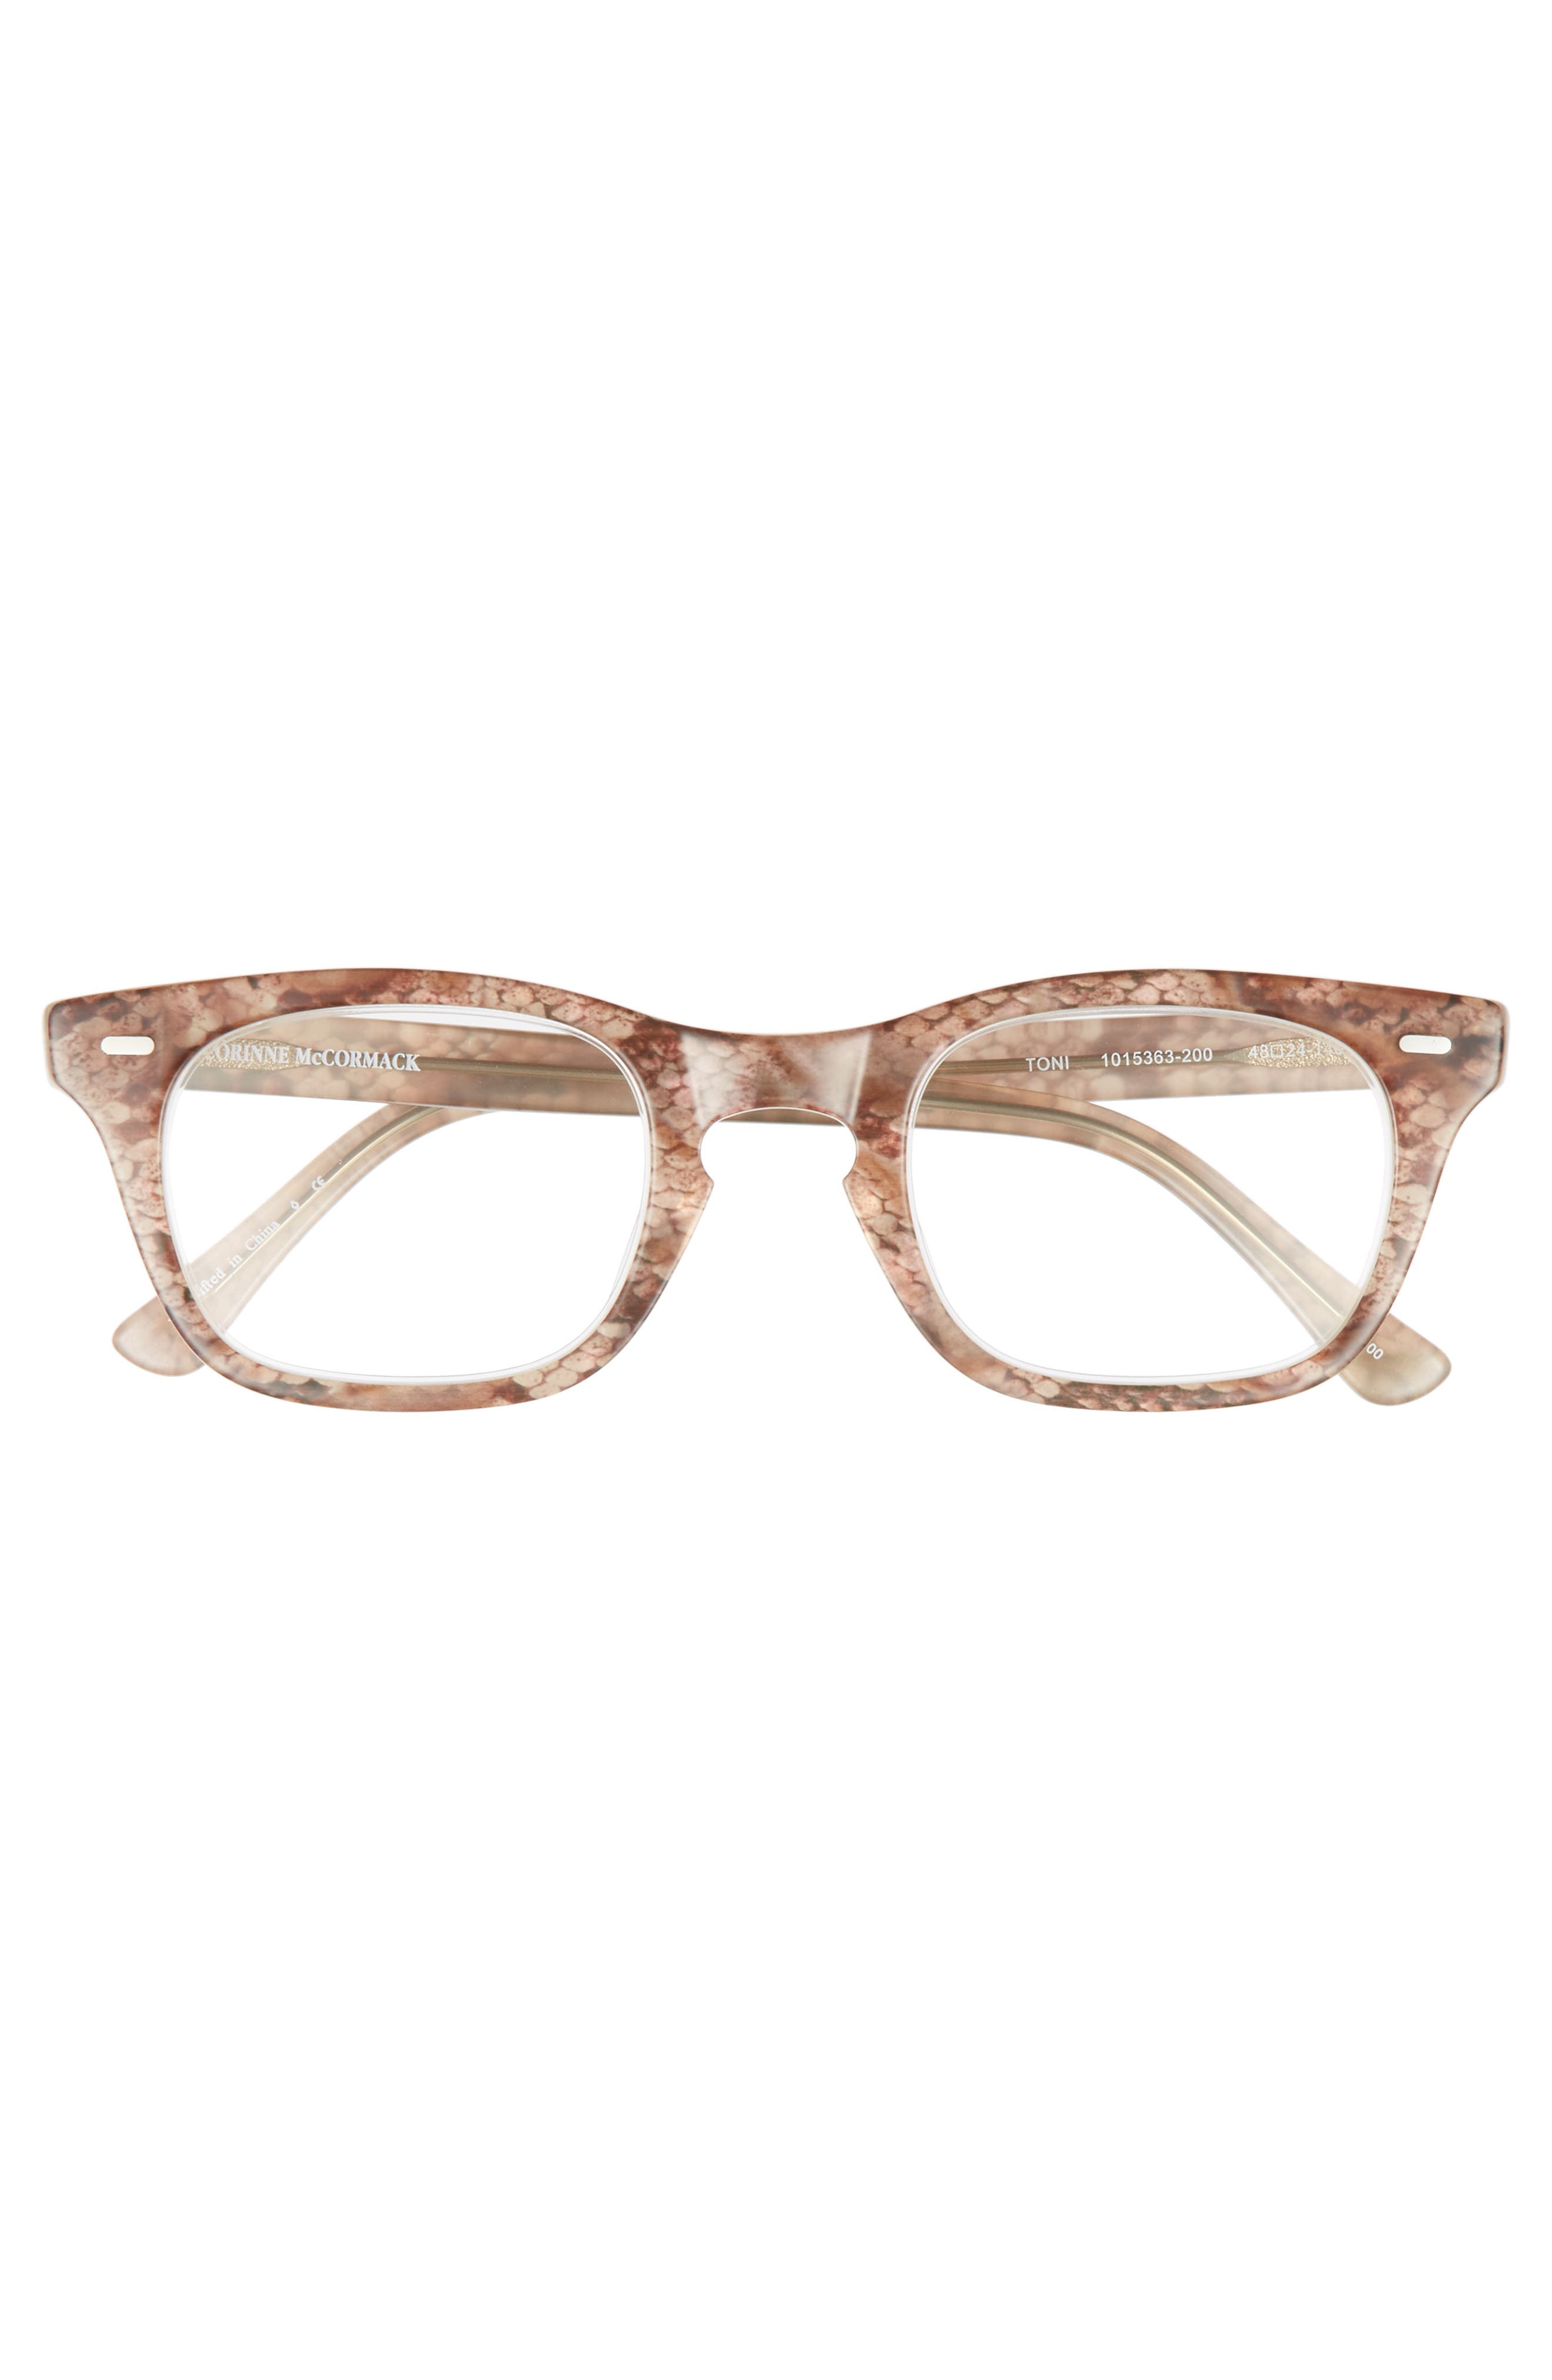 'Toni' 48mm Reading Glasses,                             Alternate thumbnail 3, color,                             Brown Snake